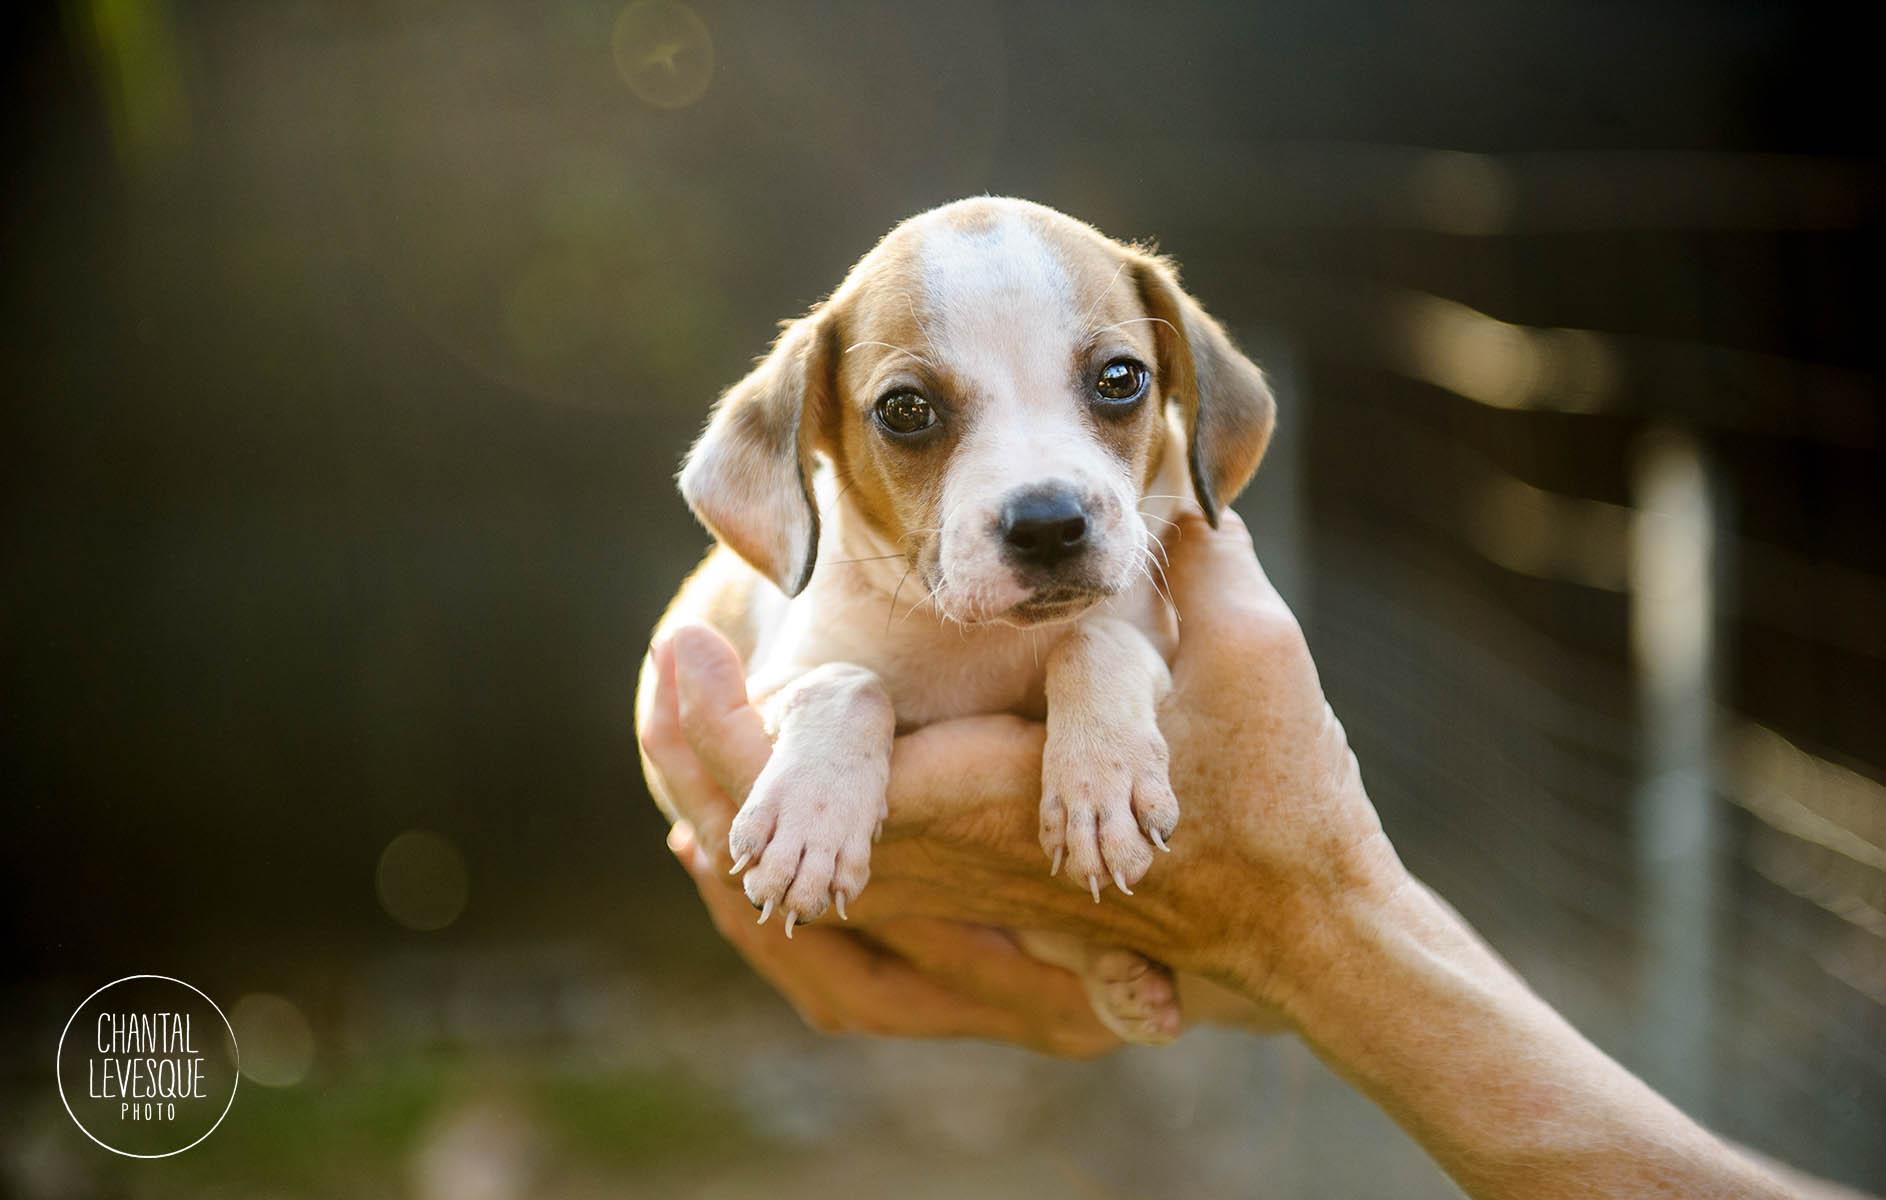 puppy-Levesque-5178-web.jpg